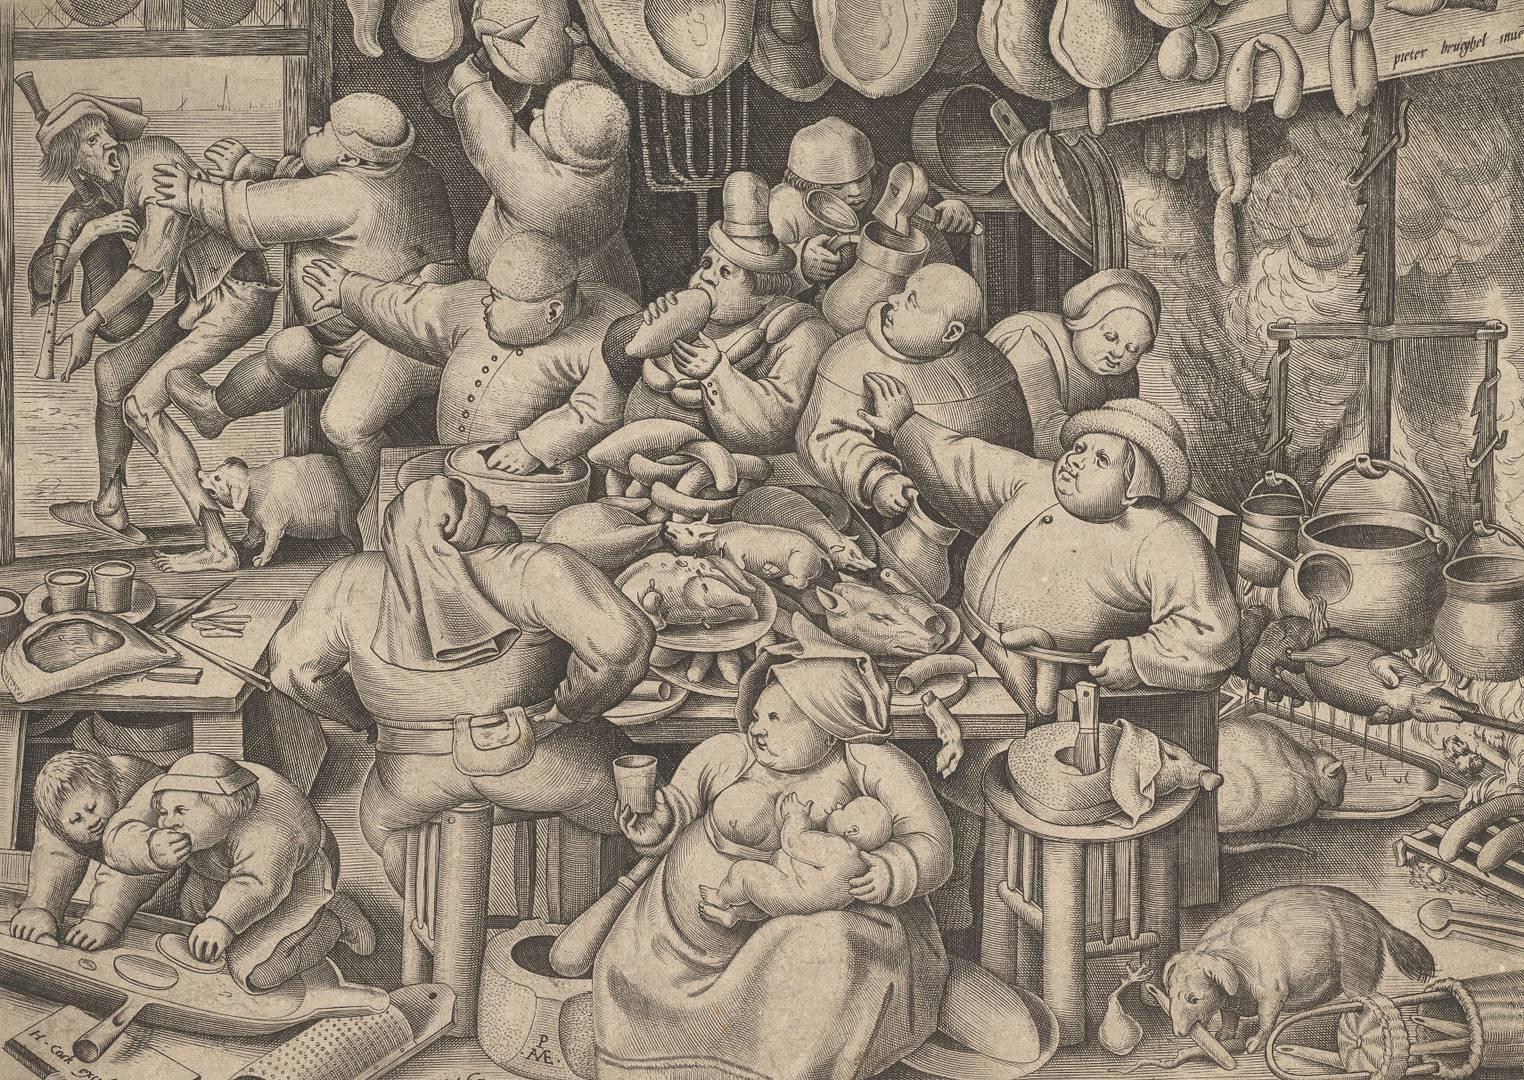 Питер Ван дер Хейден после Питера Брейгеля Старшего. Кухня тучных. 1563